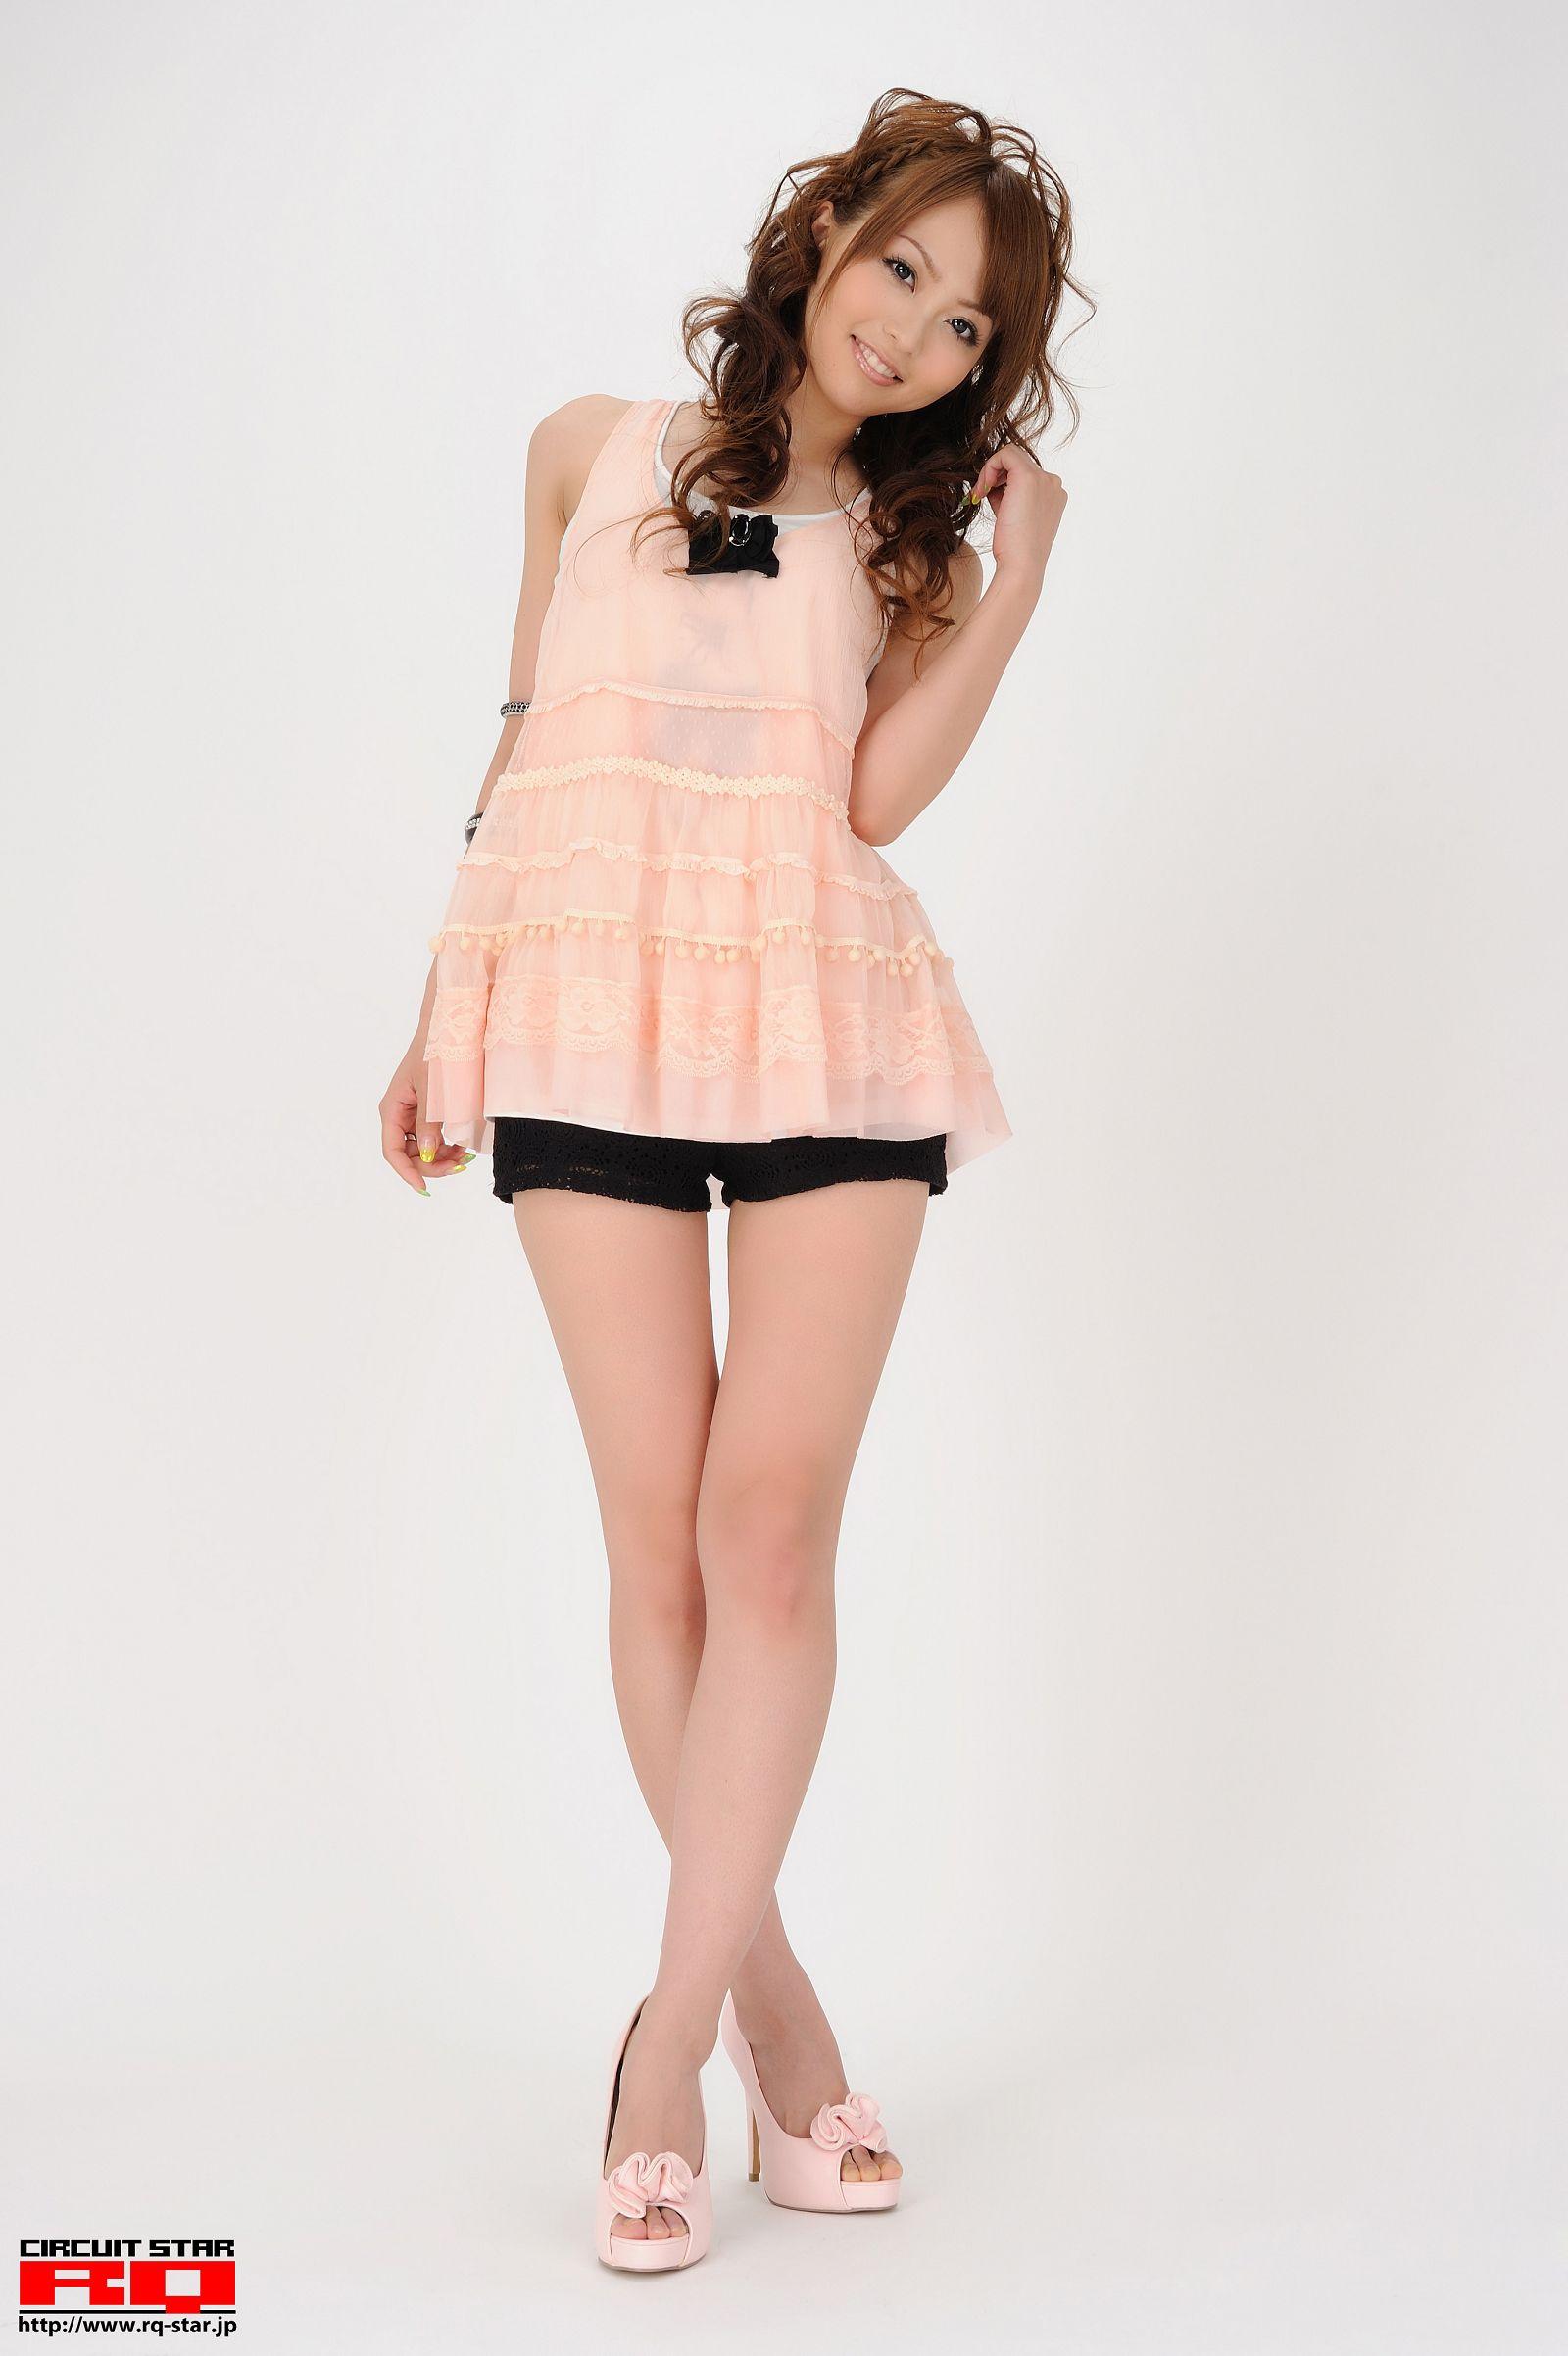 [RQ STAR美女] NO.0297 Momoka Narushima 成島桃香 Private Dress[100P] RQ STAR 第1张